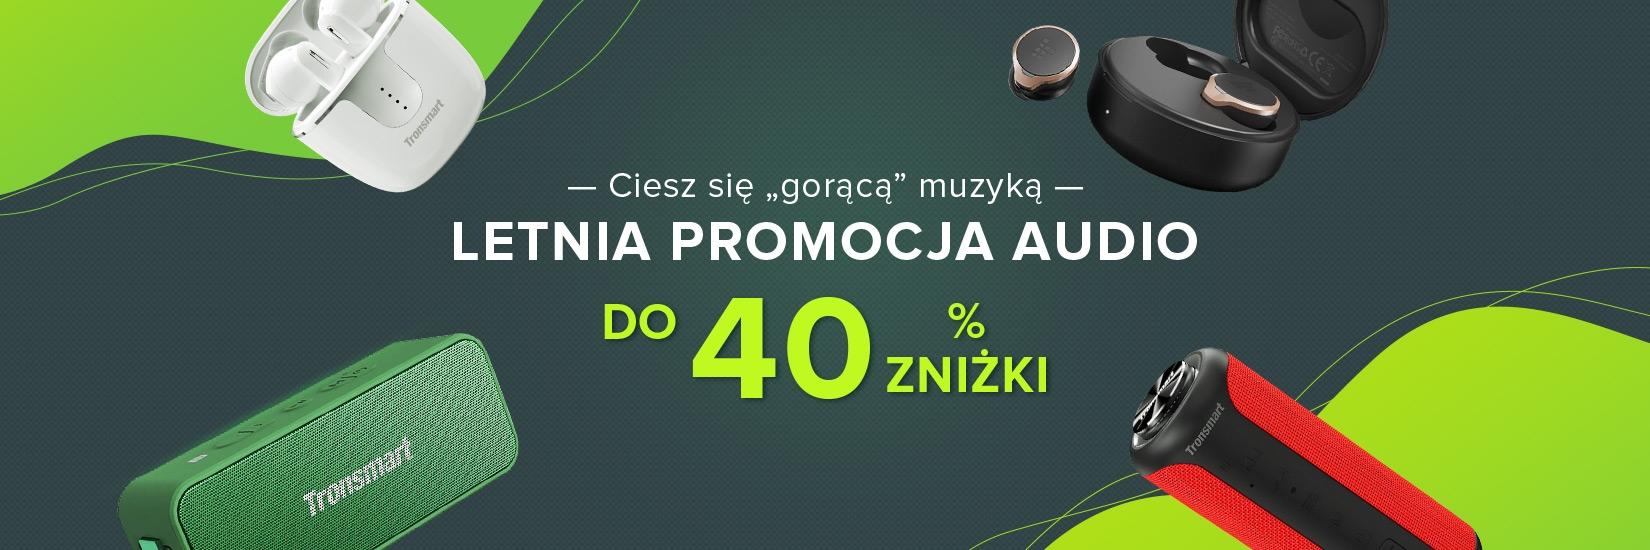 Letnia Promocja Audio - Geekbuying.pl